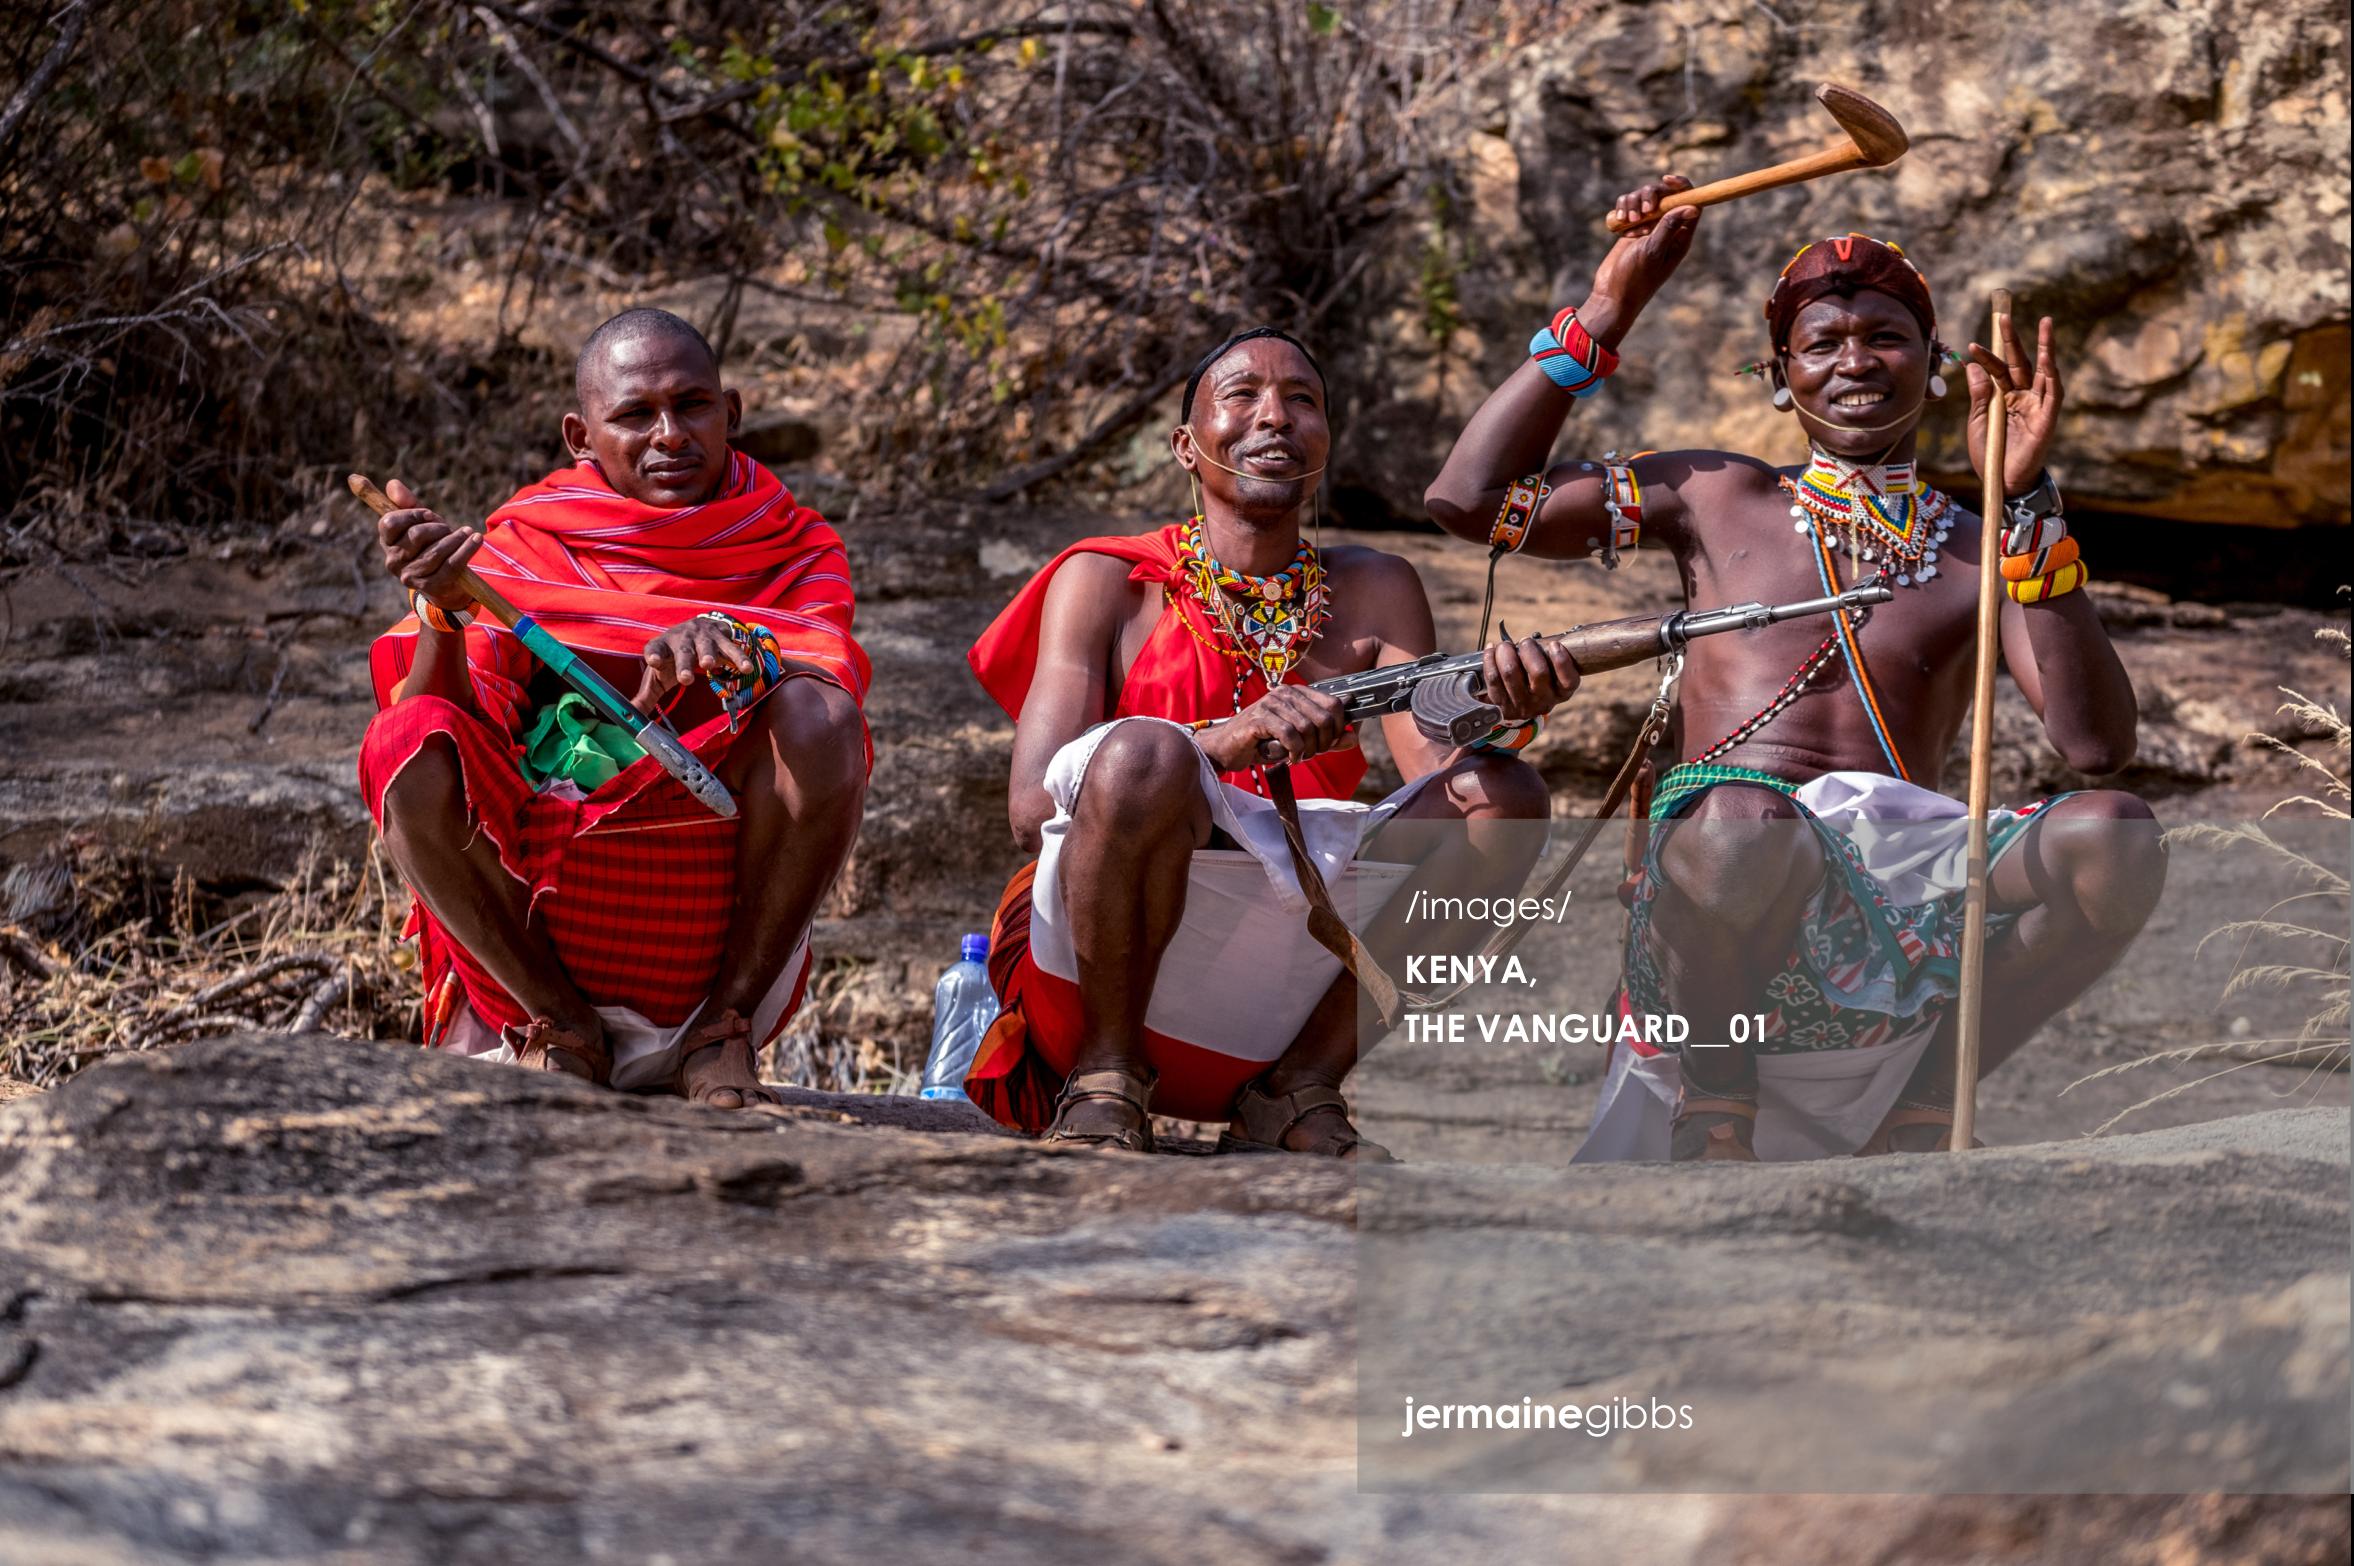 Kenya_The Vanguard__01